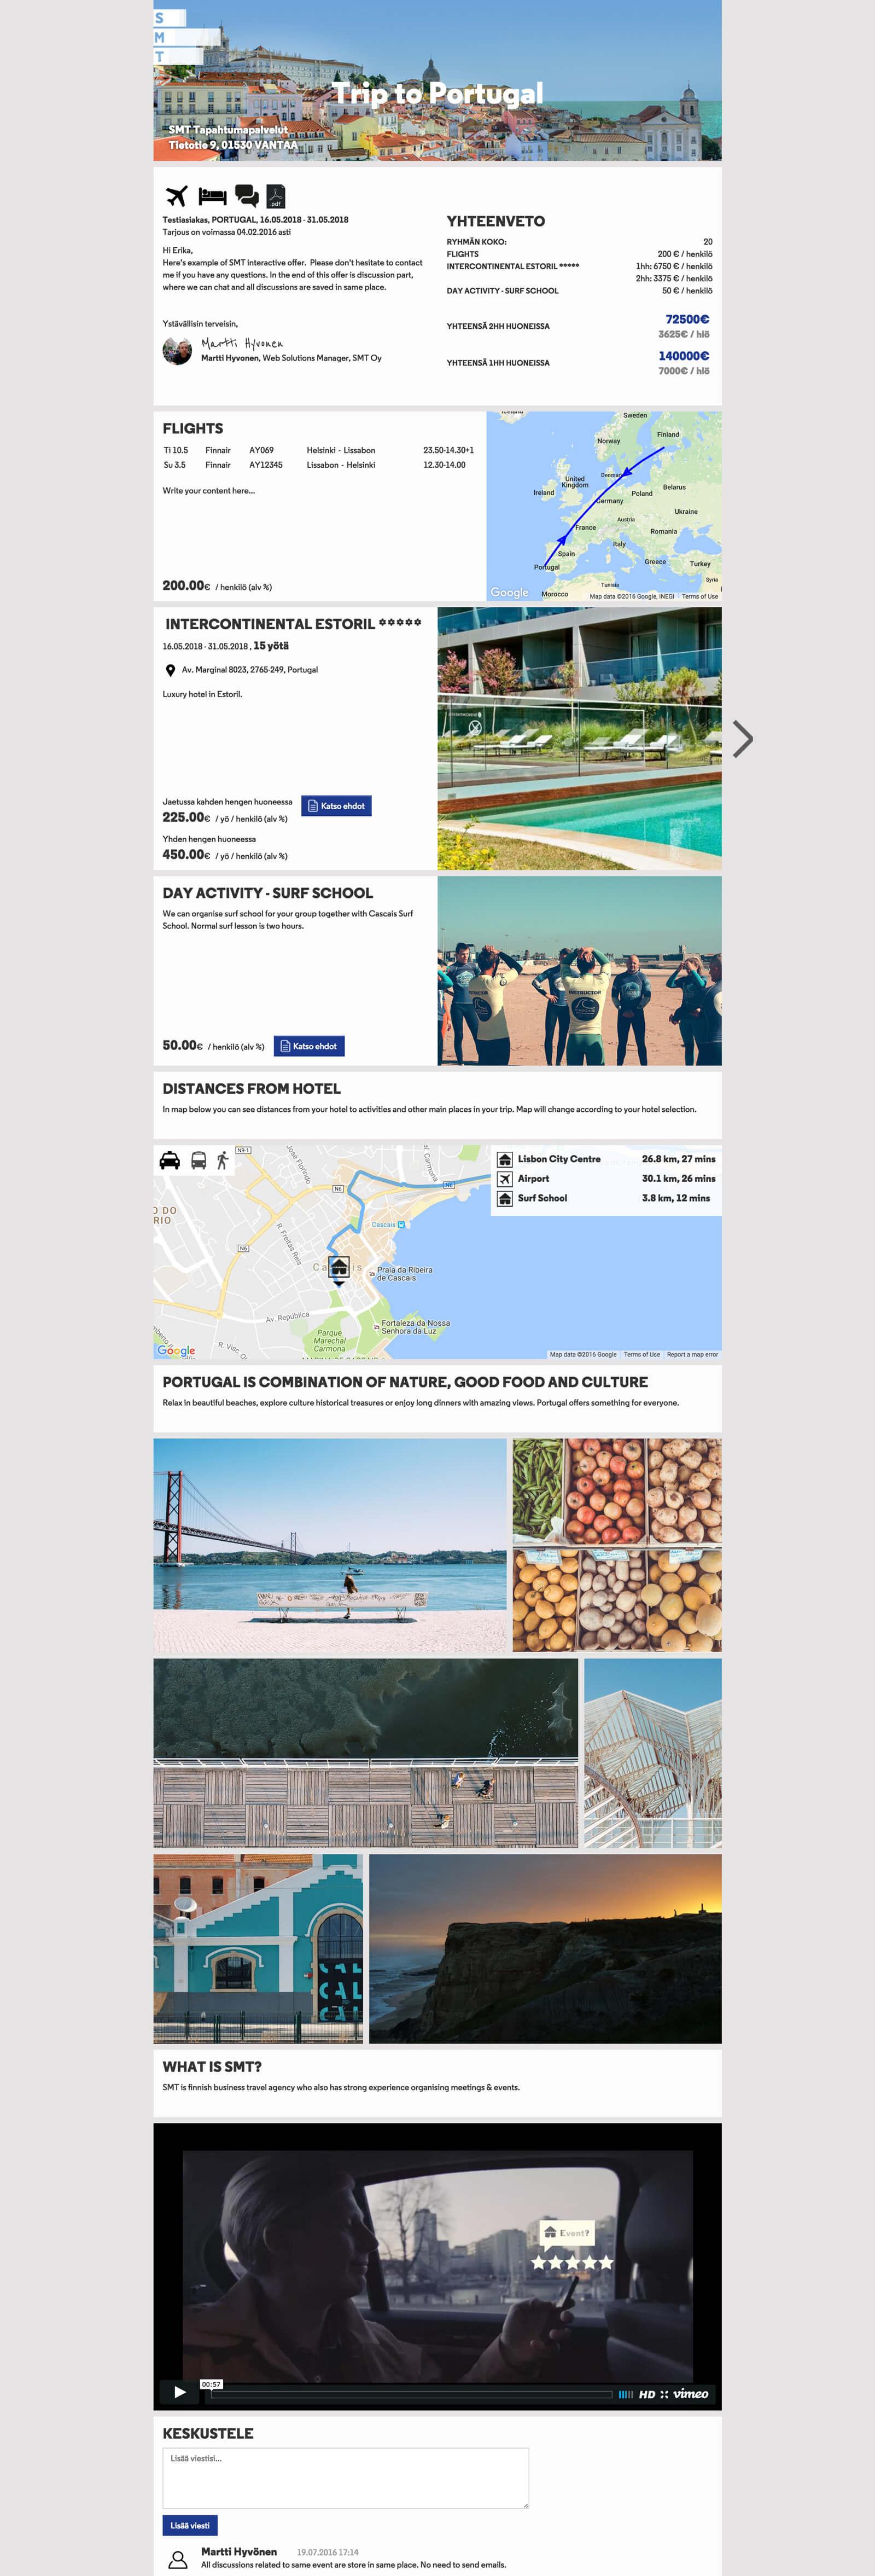 eventsapp-portugal-trip-1600